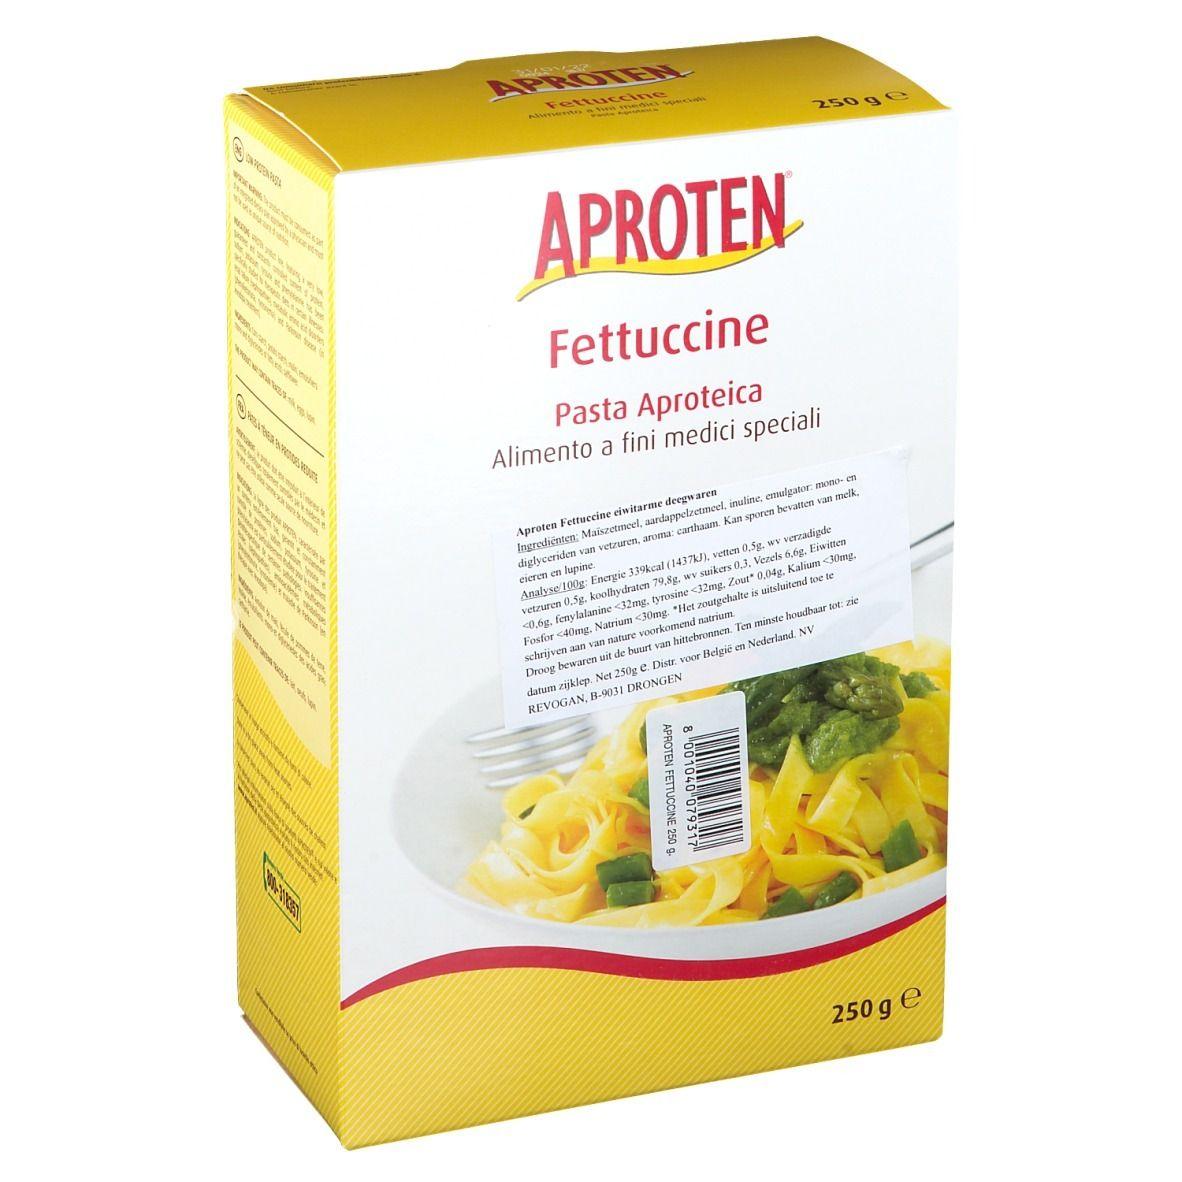 Image of APROTEN® Fettucine eiweißarme Pasta